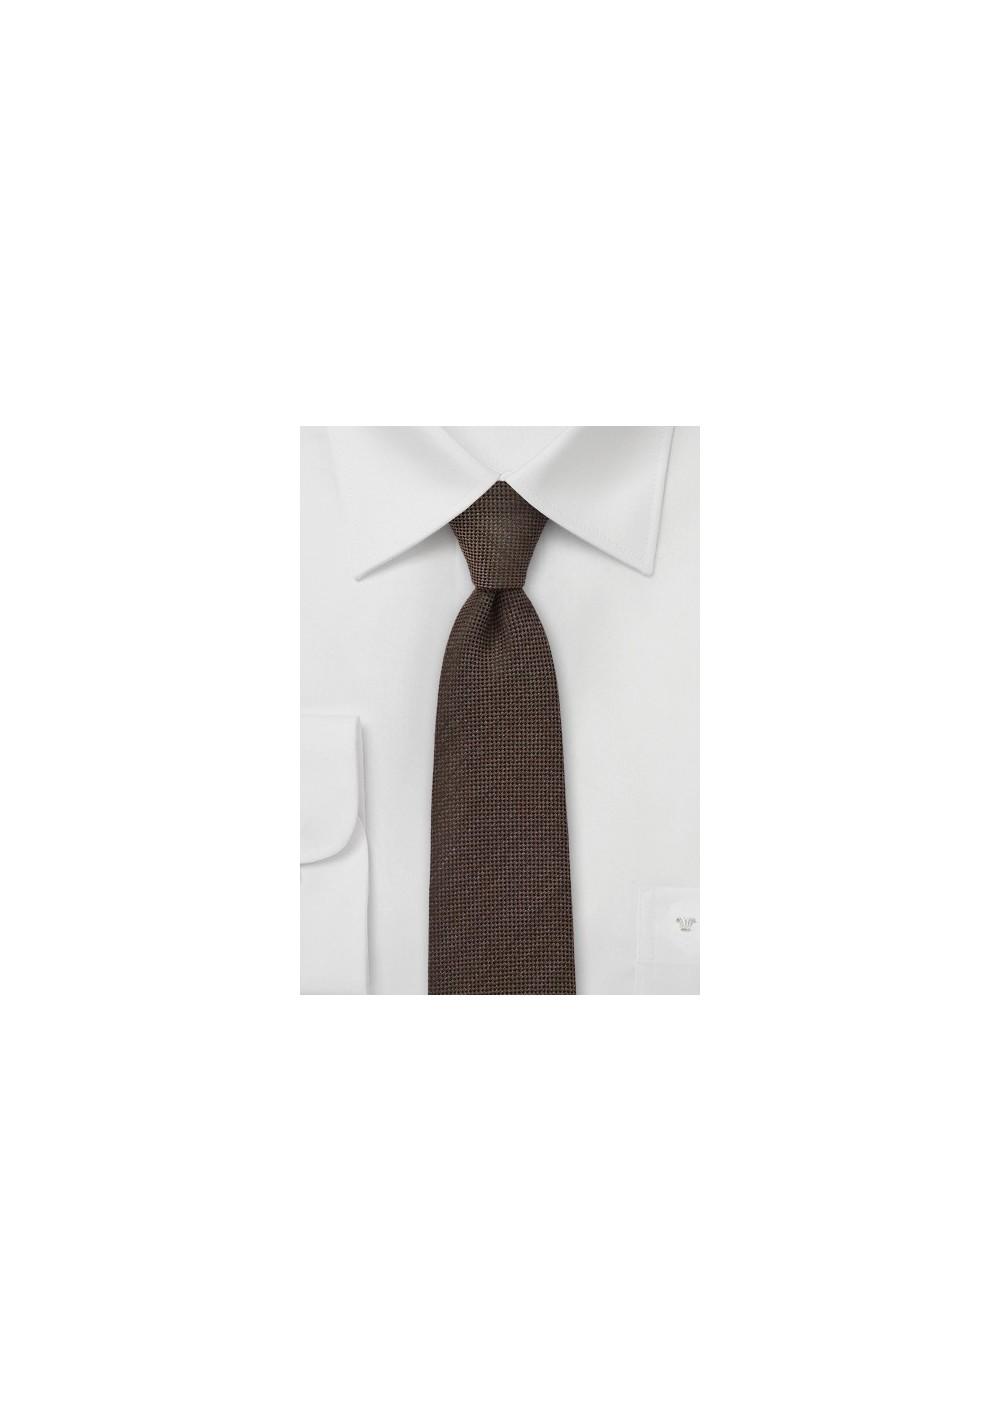 Espresso Brown Skinny Tie by BlackBird